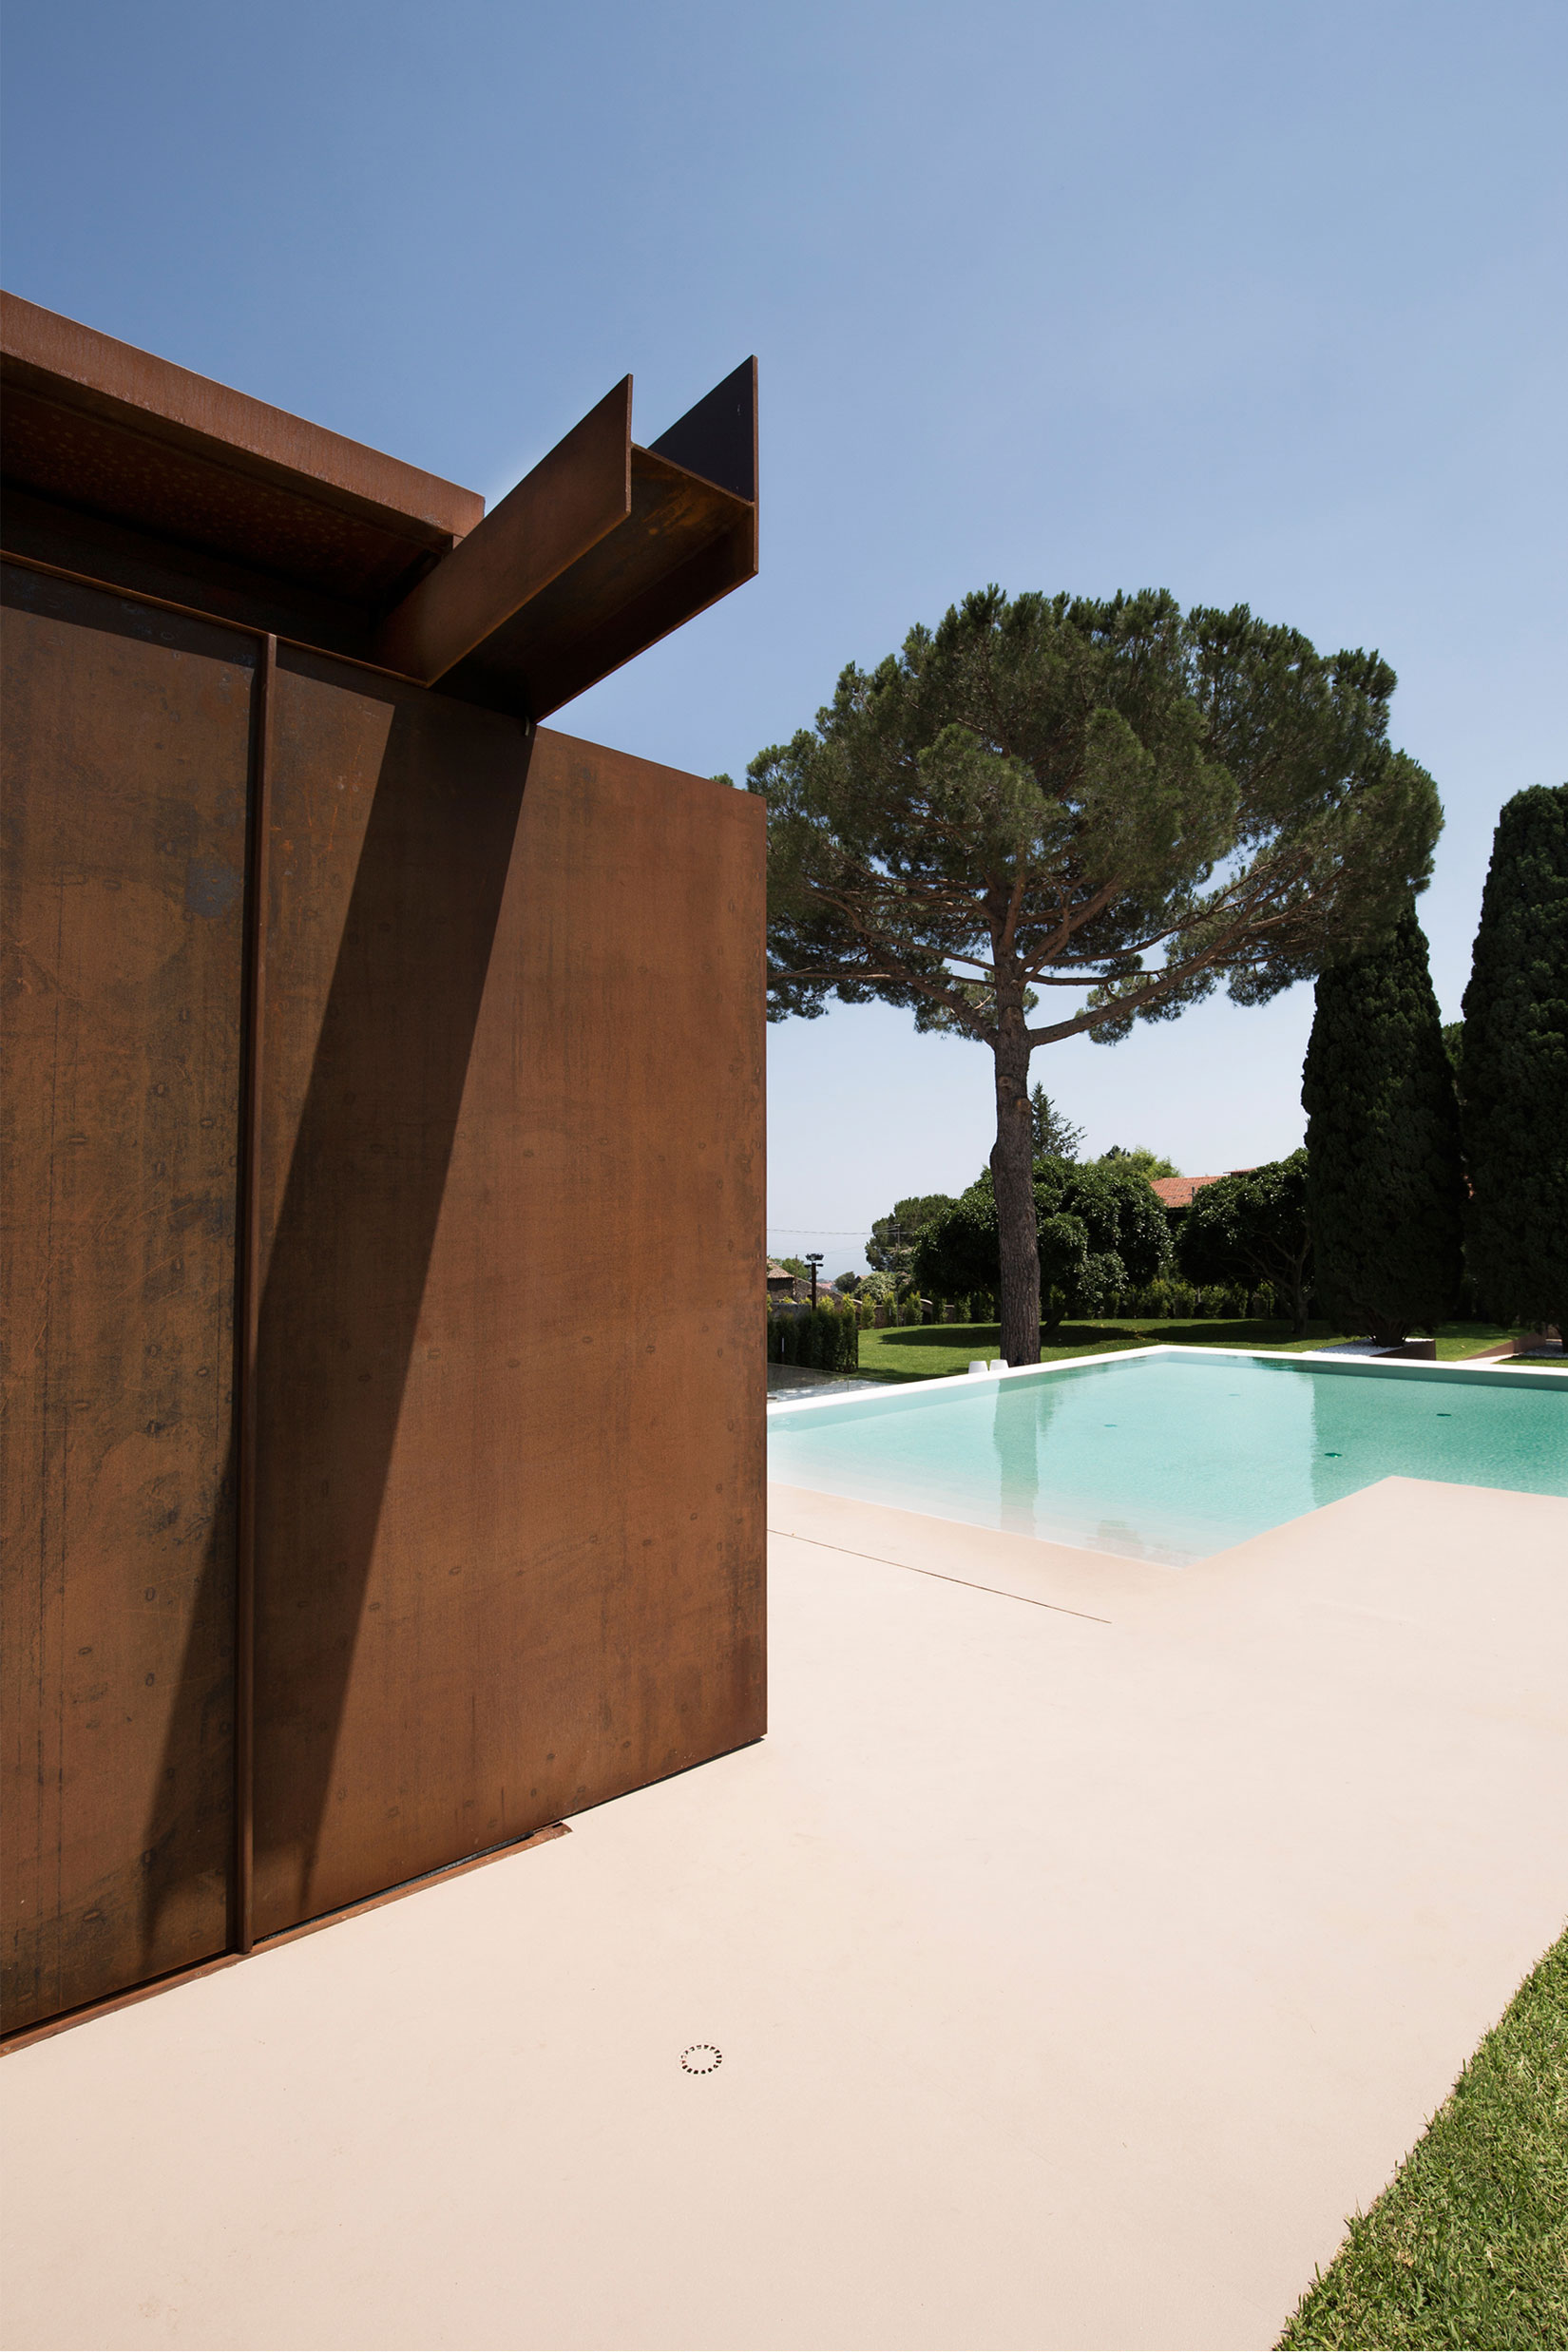 CRV House in Viagrande by ACA Amore Campione Architettura-07